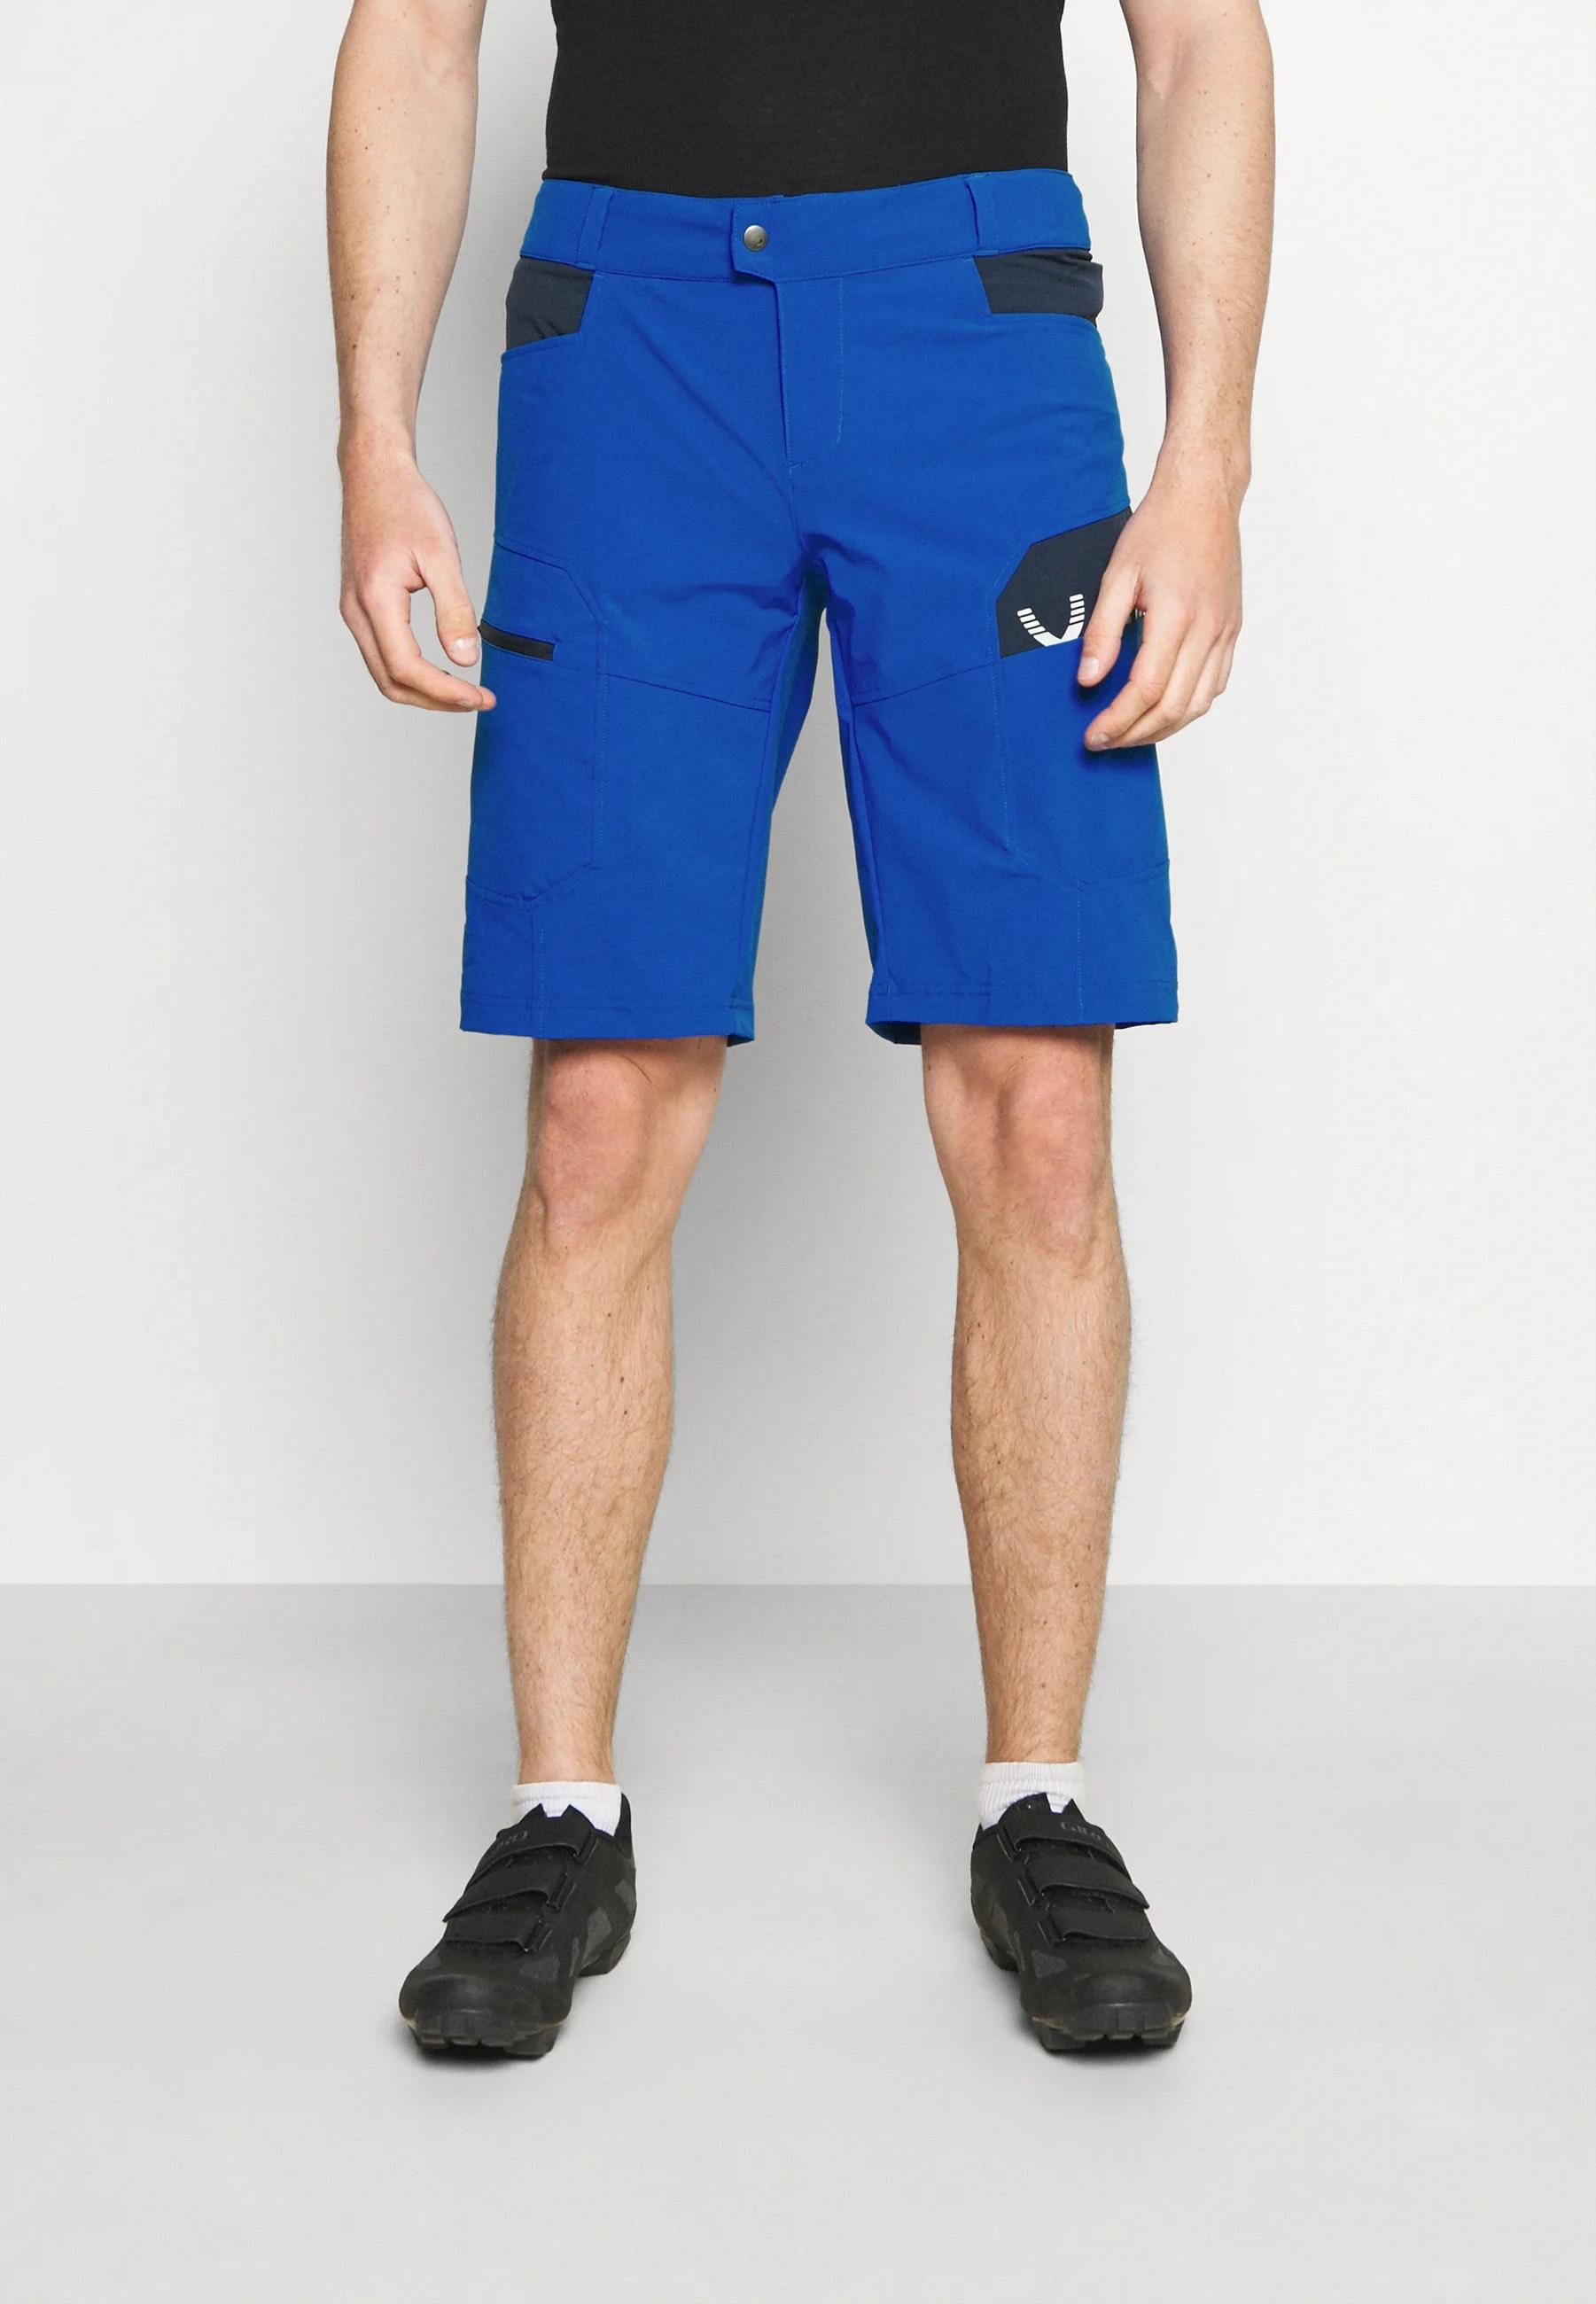 VAUDE Men's Altissimo Shorts III (Größe S)